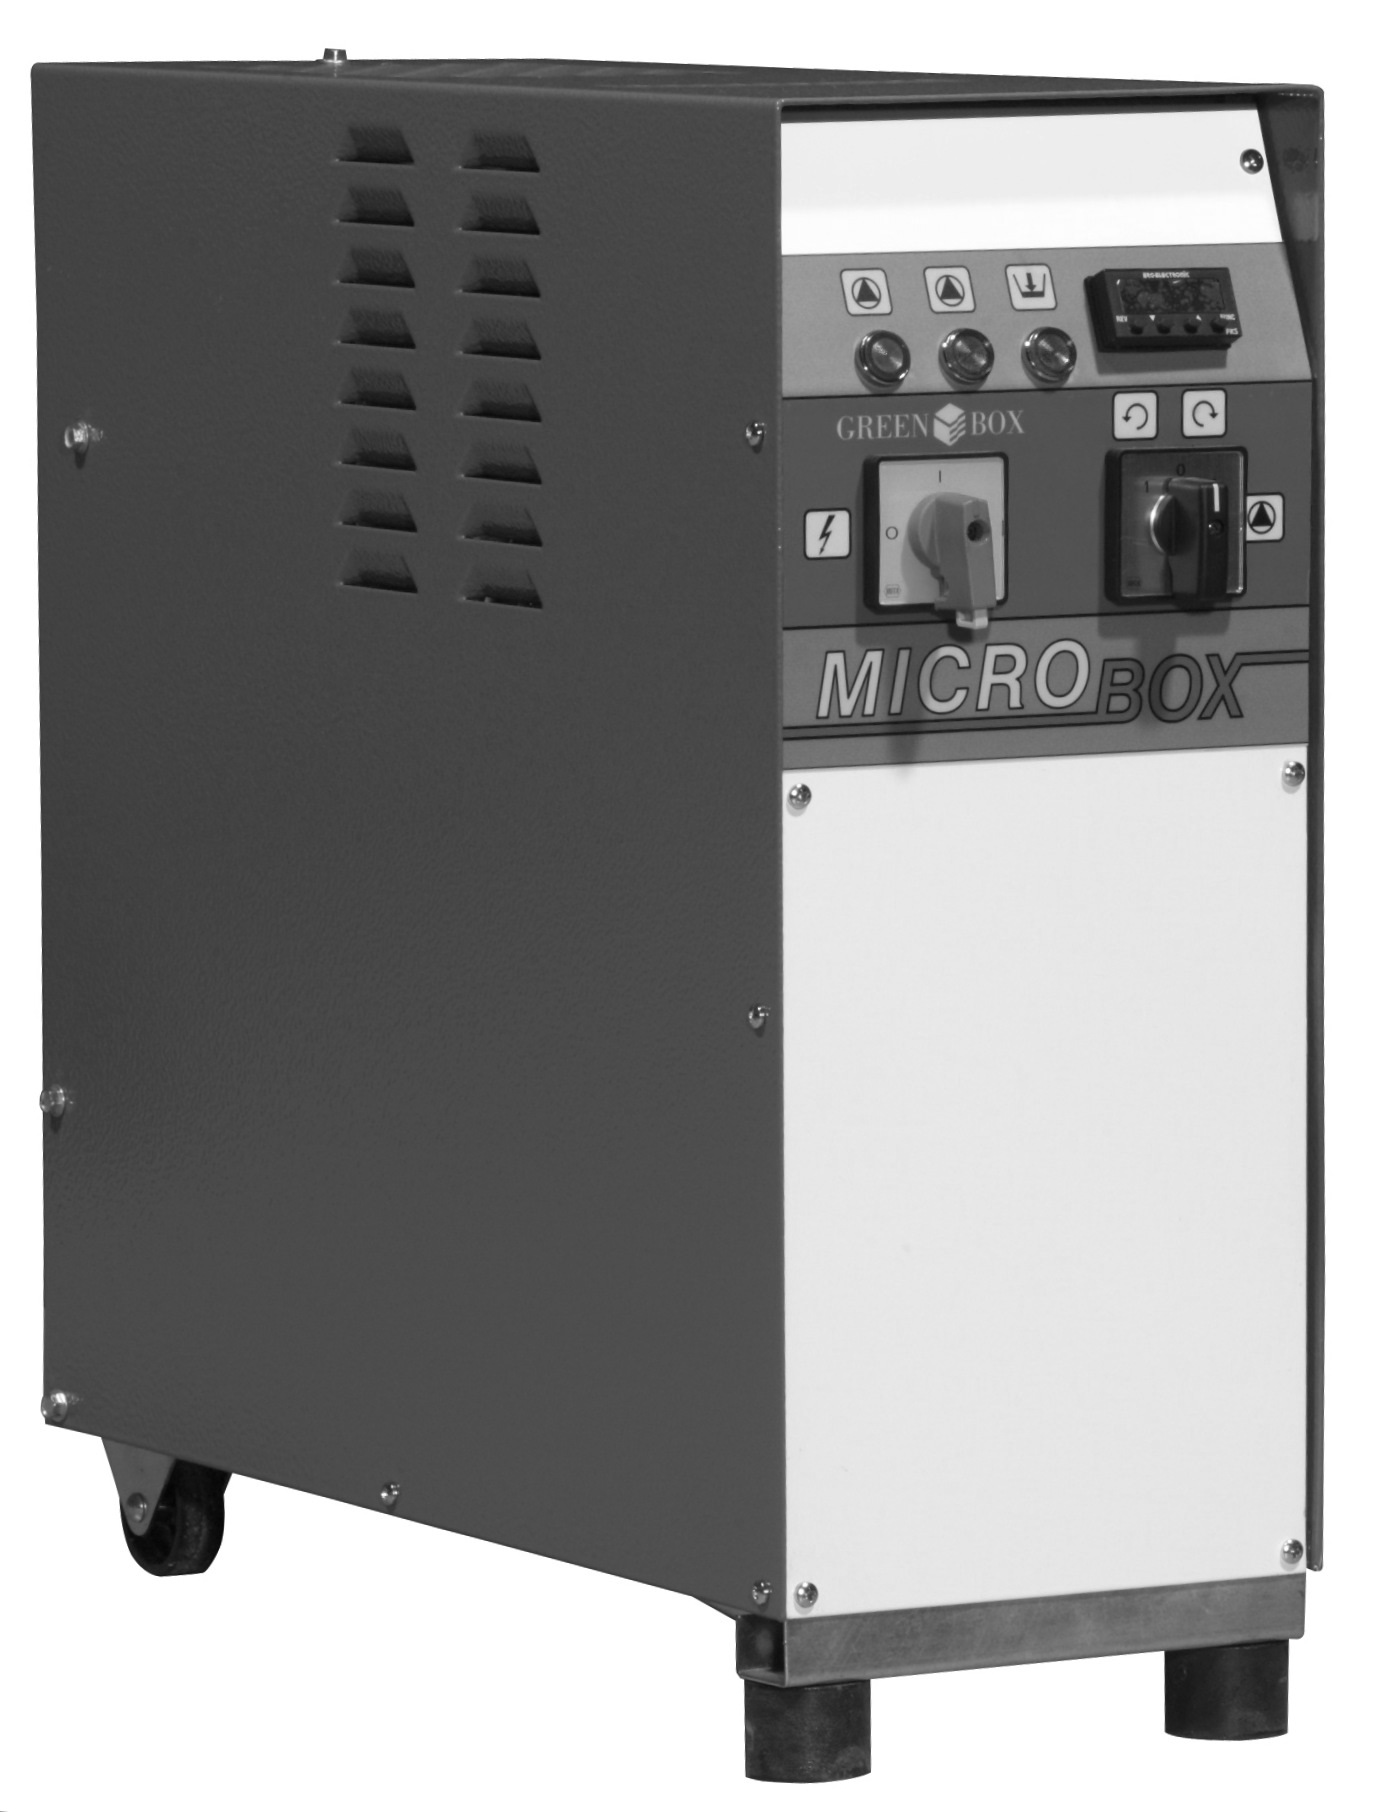 Temperature controller MICROBOX IBC Chillers #BA9A11